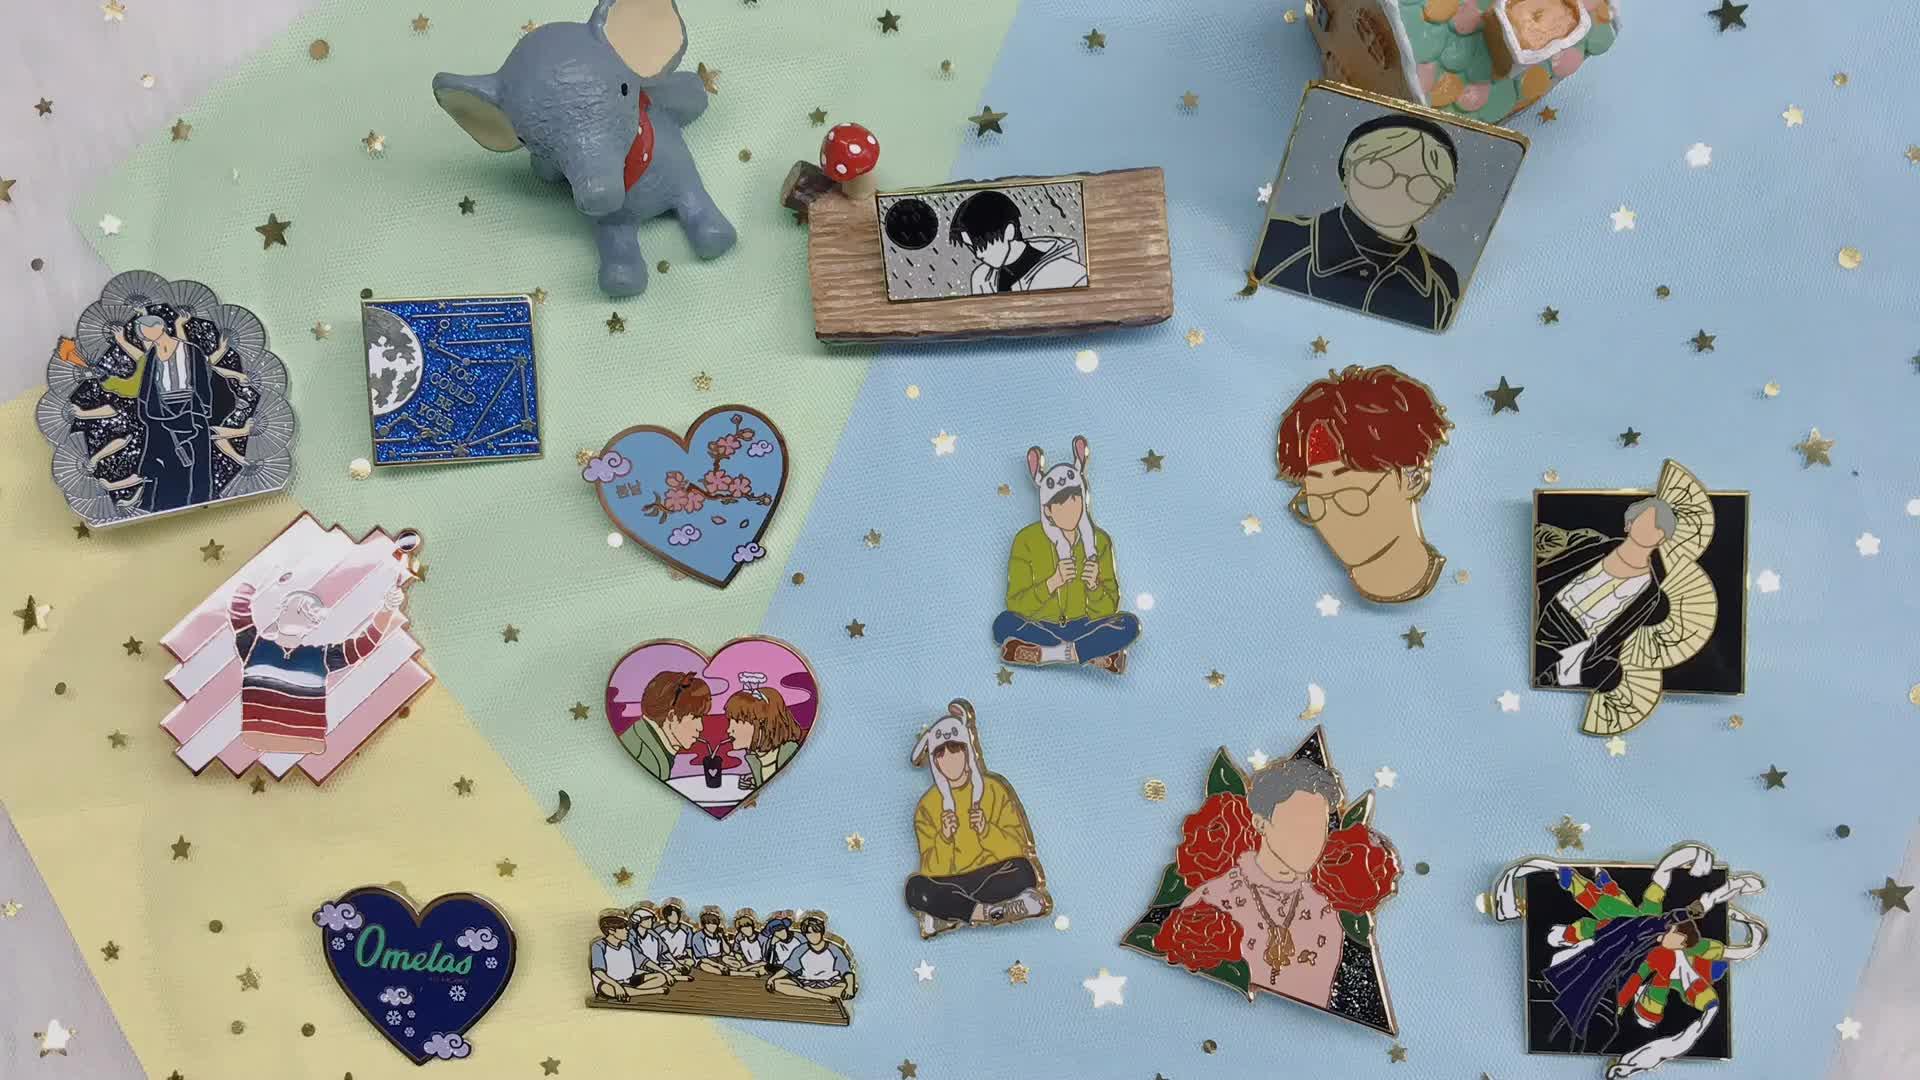 Korea Idola Keras Enamel Kerah Kustom Logam Bros Enamel Pin untuk Pin Kekasih Karakter Kartun Kerah Pin